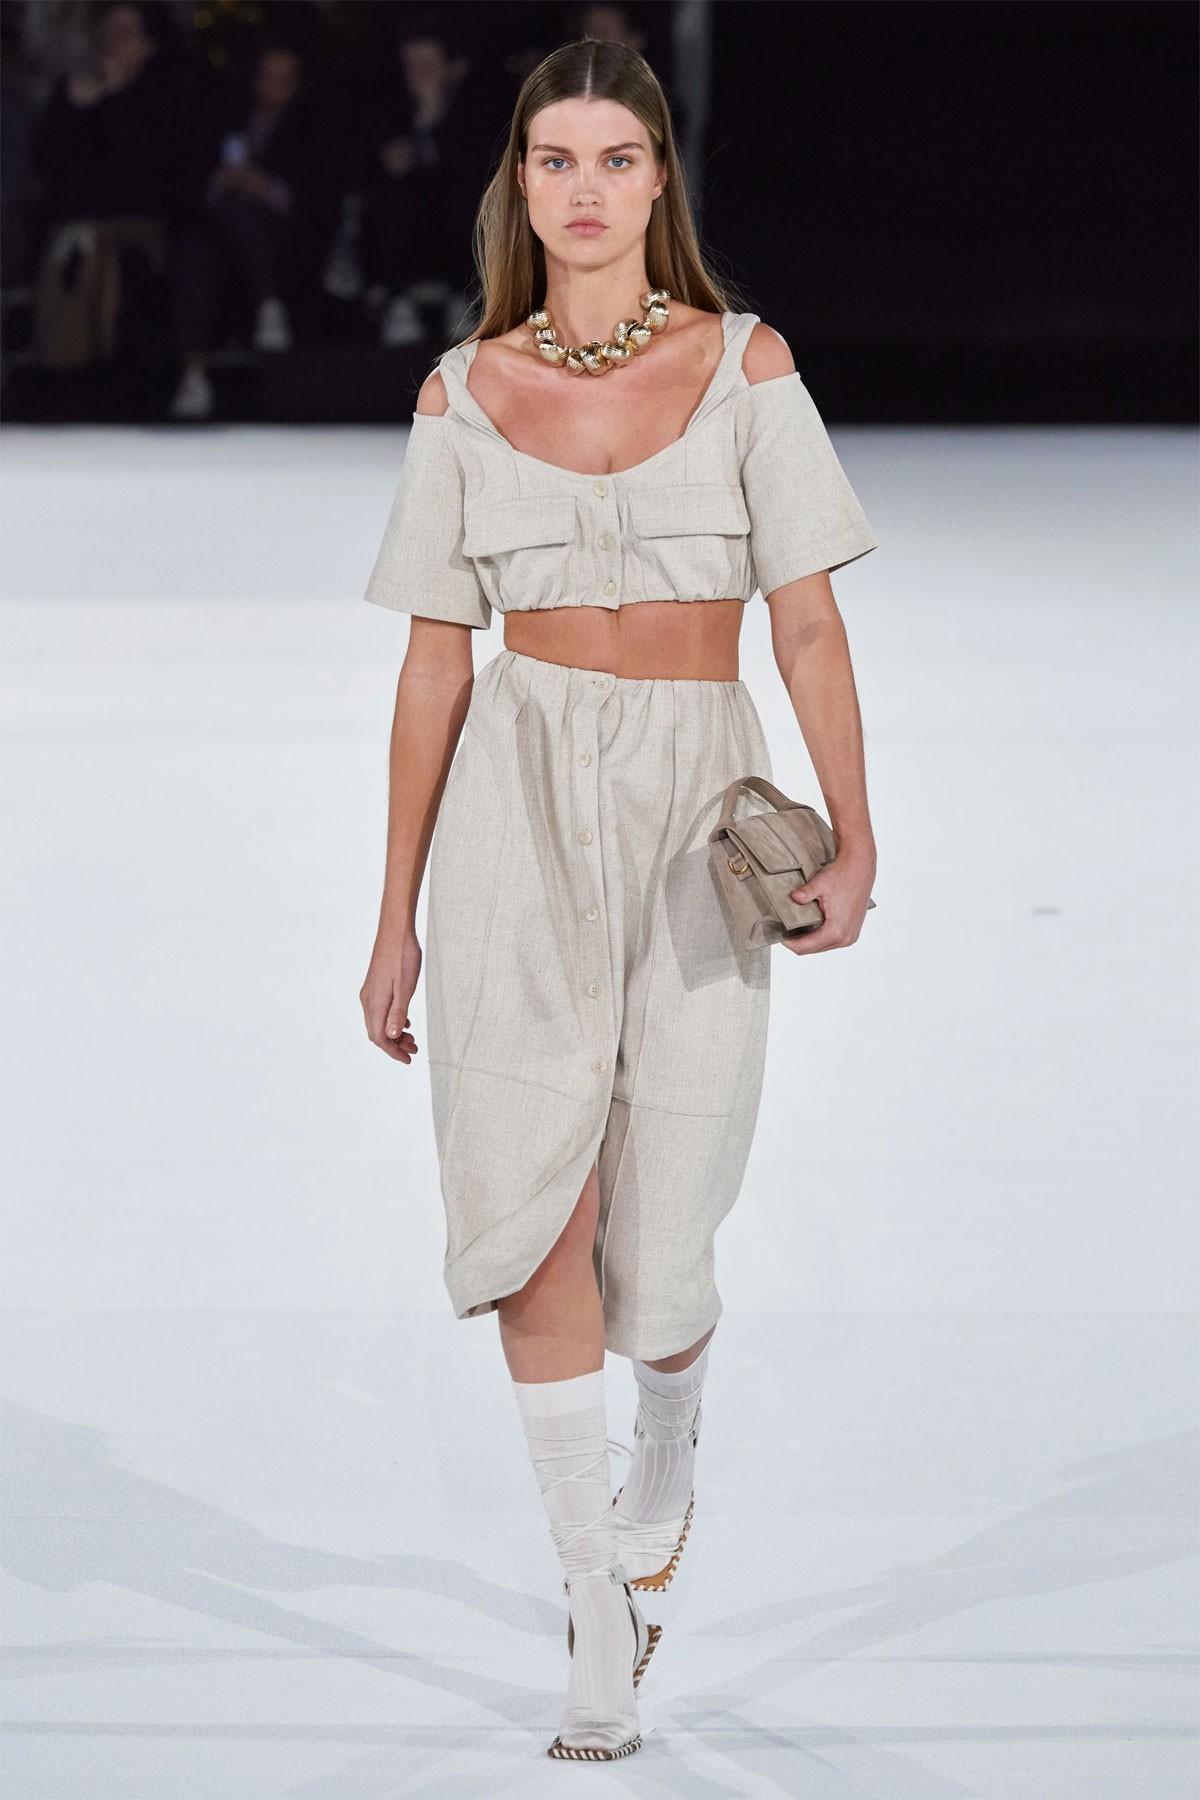 jacquemus simon porte fall winter show Paris fashion week womens mens collection